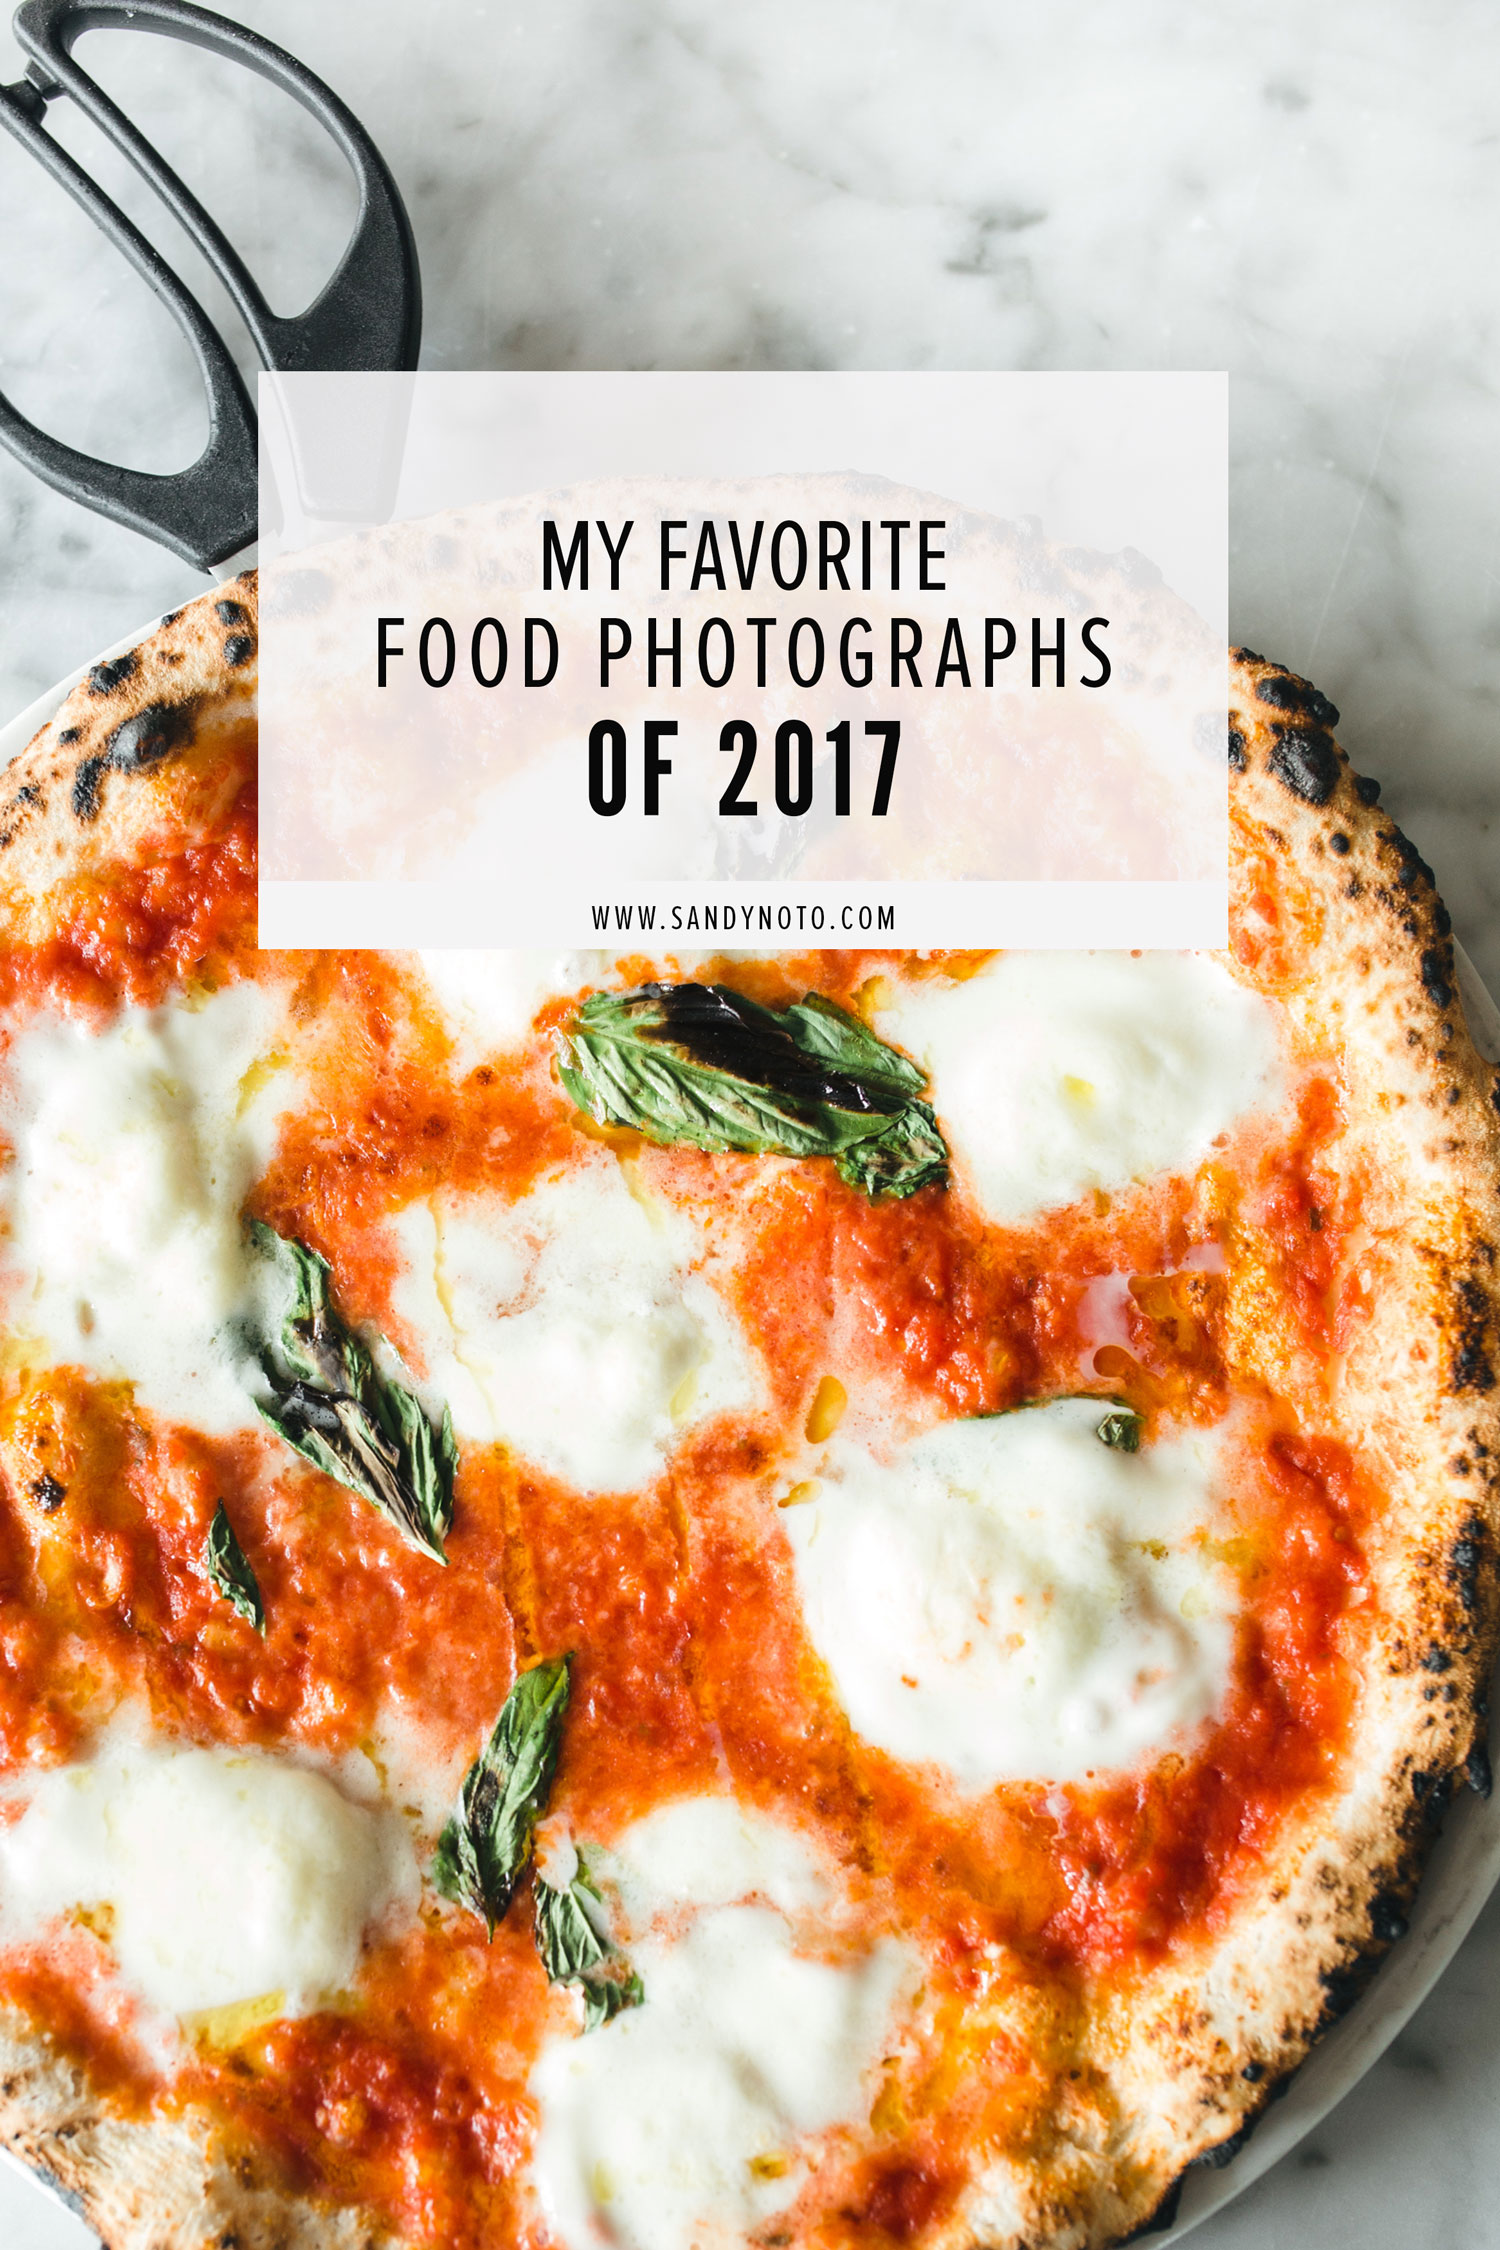 Favorite Food Photographs of 2017